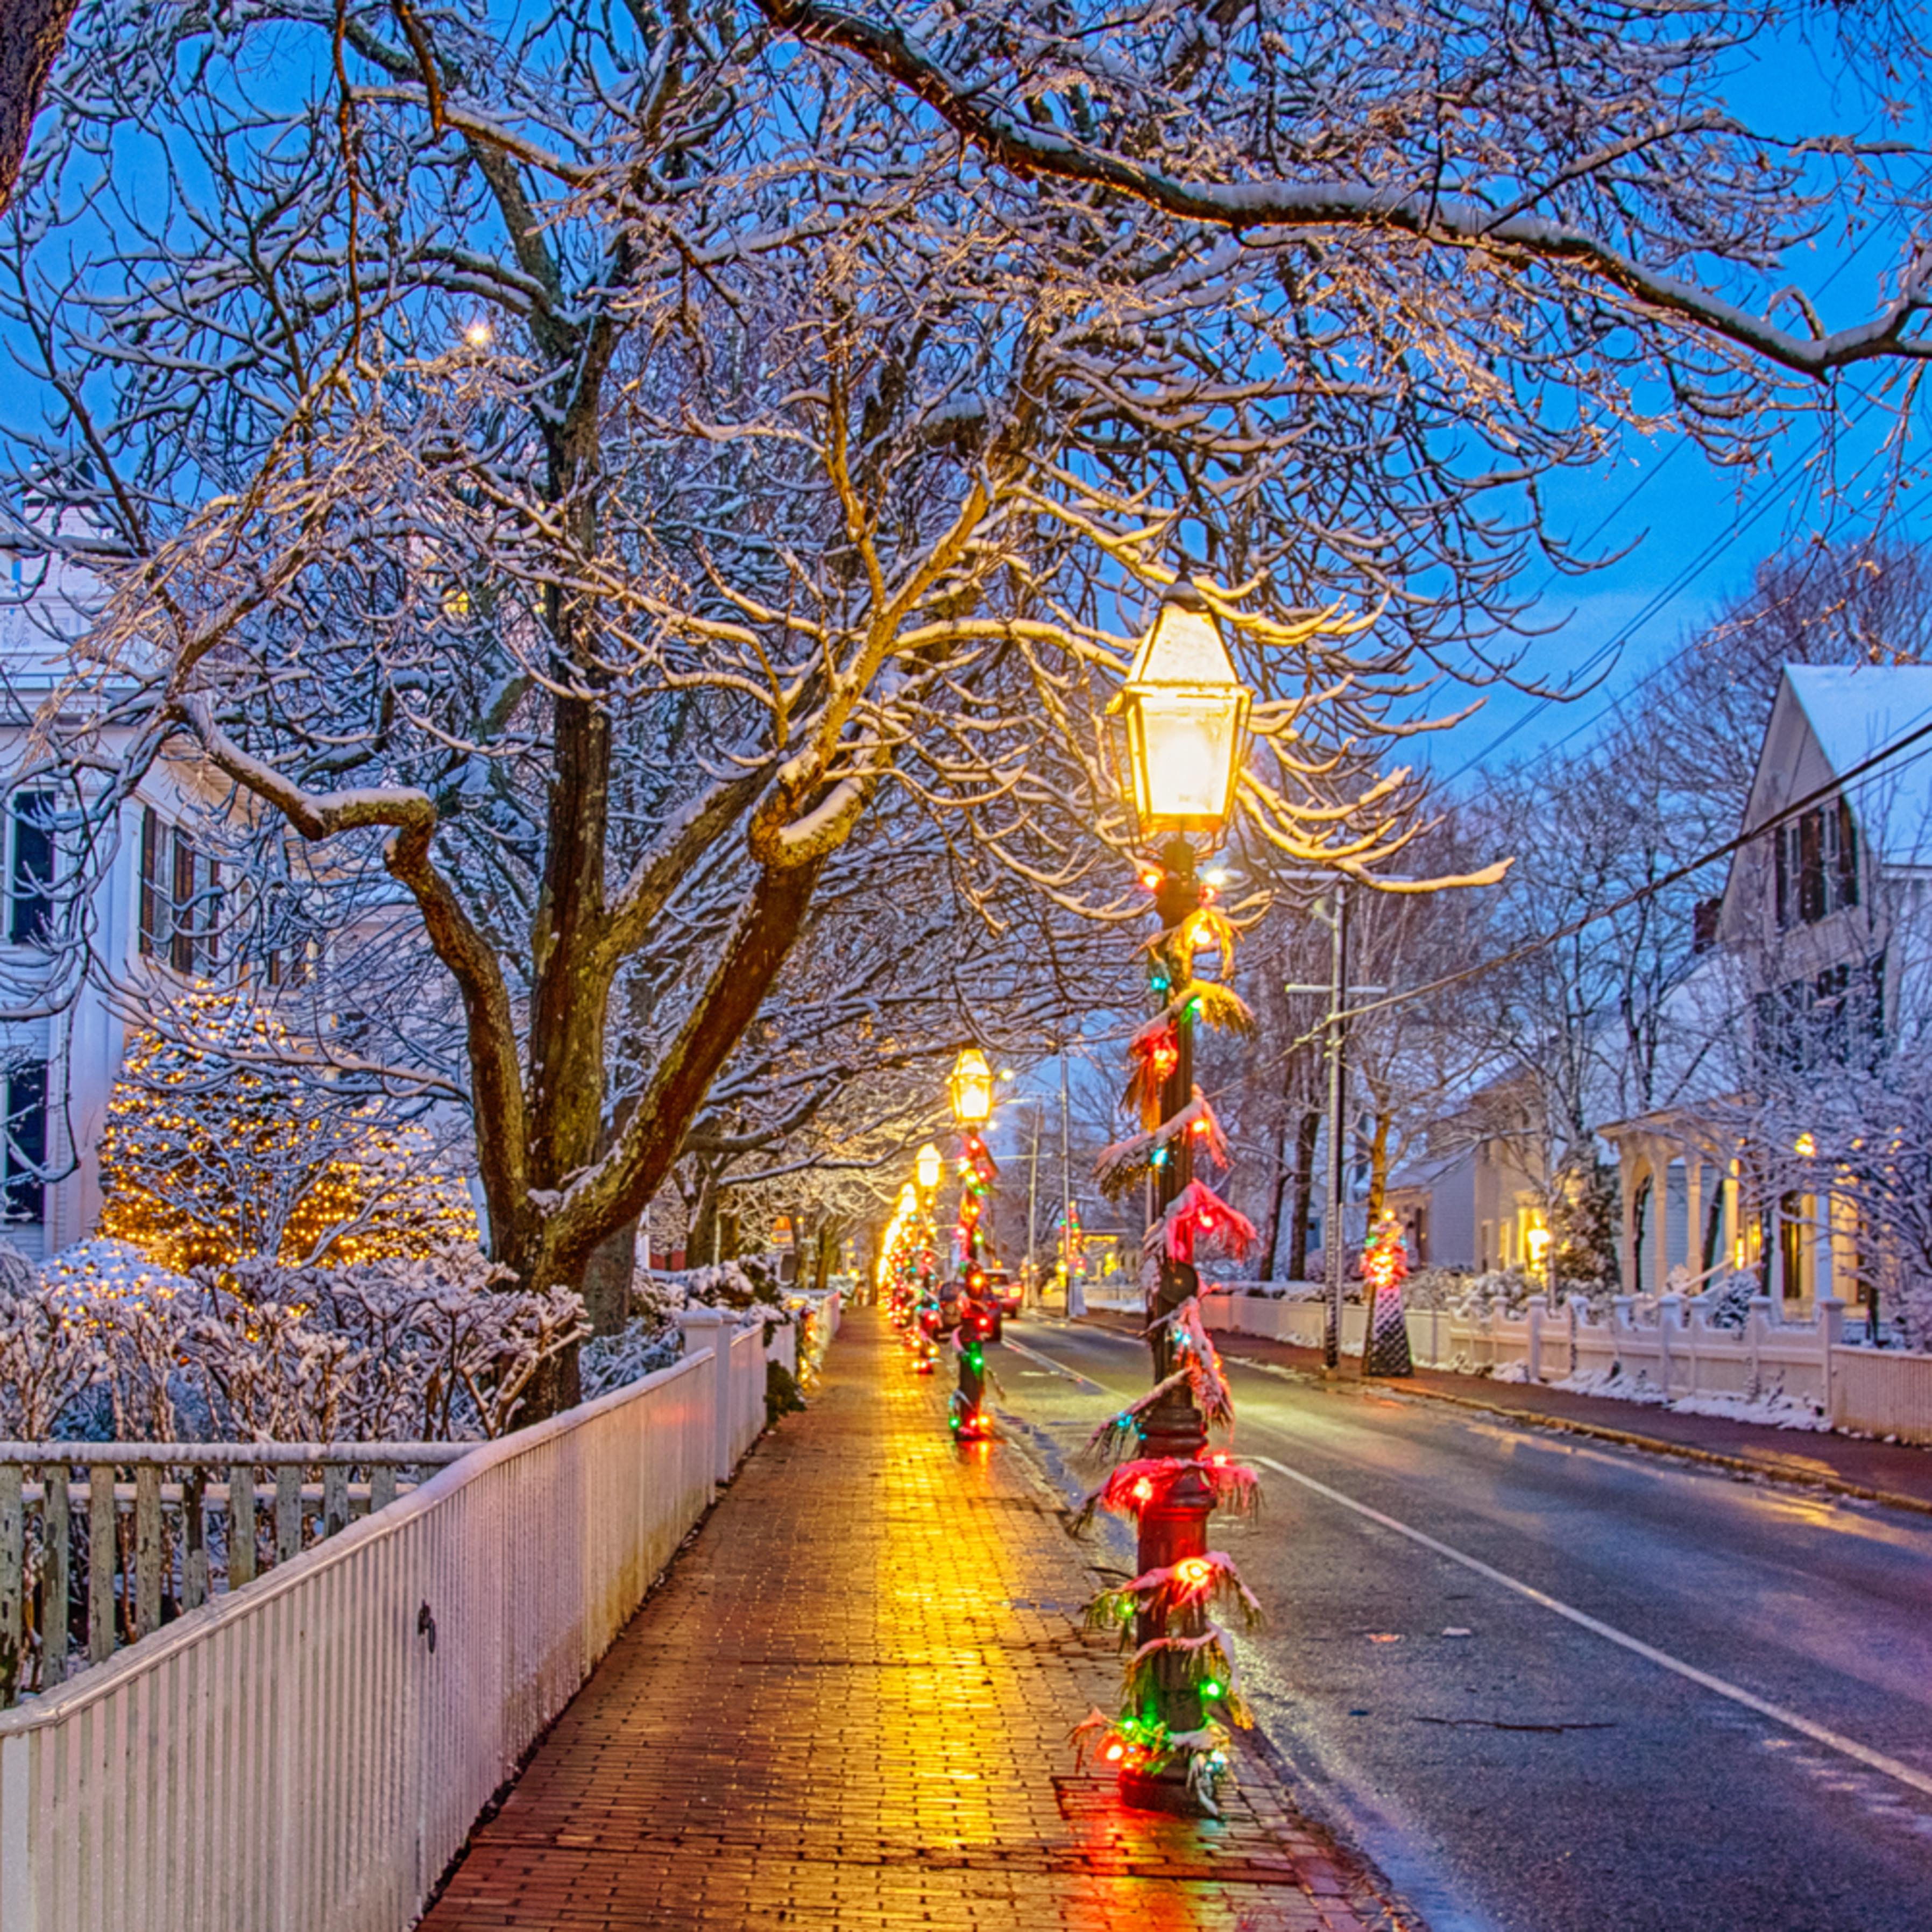 Edgartown main street snow cubsof